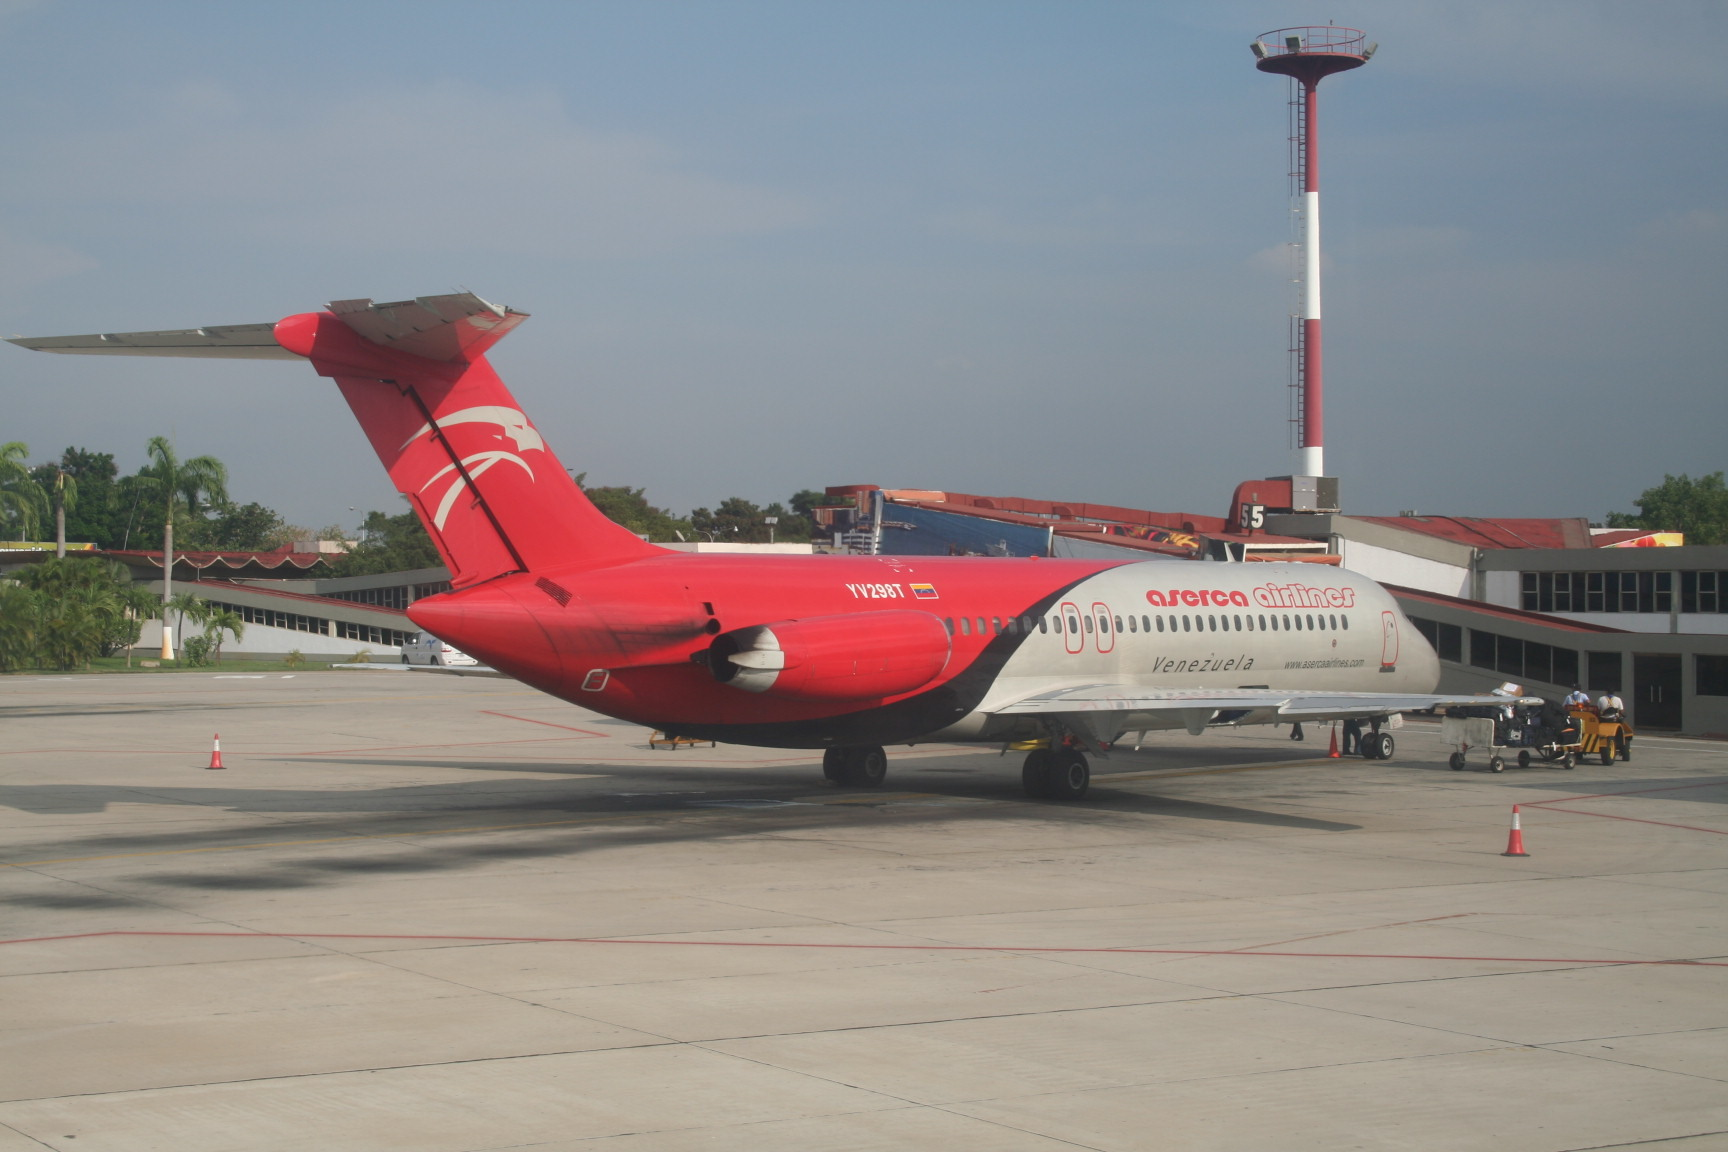 Аэропорт Вьедма